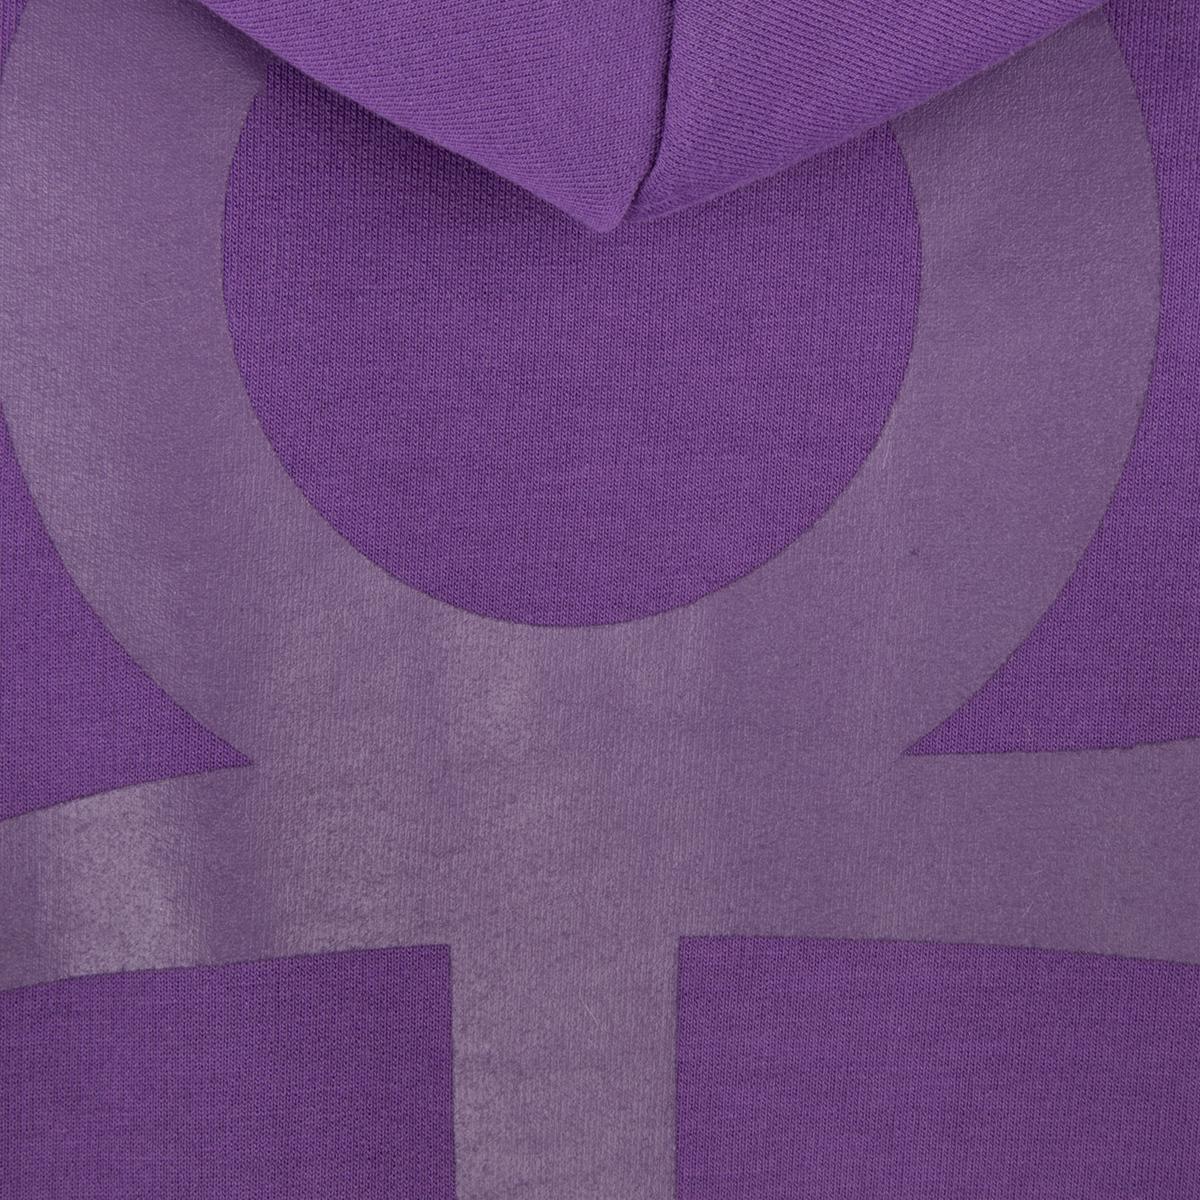 Prince Symbol Zip Hoodie with Purple Paisley Lining